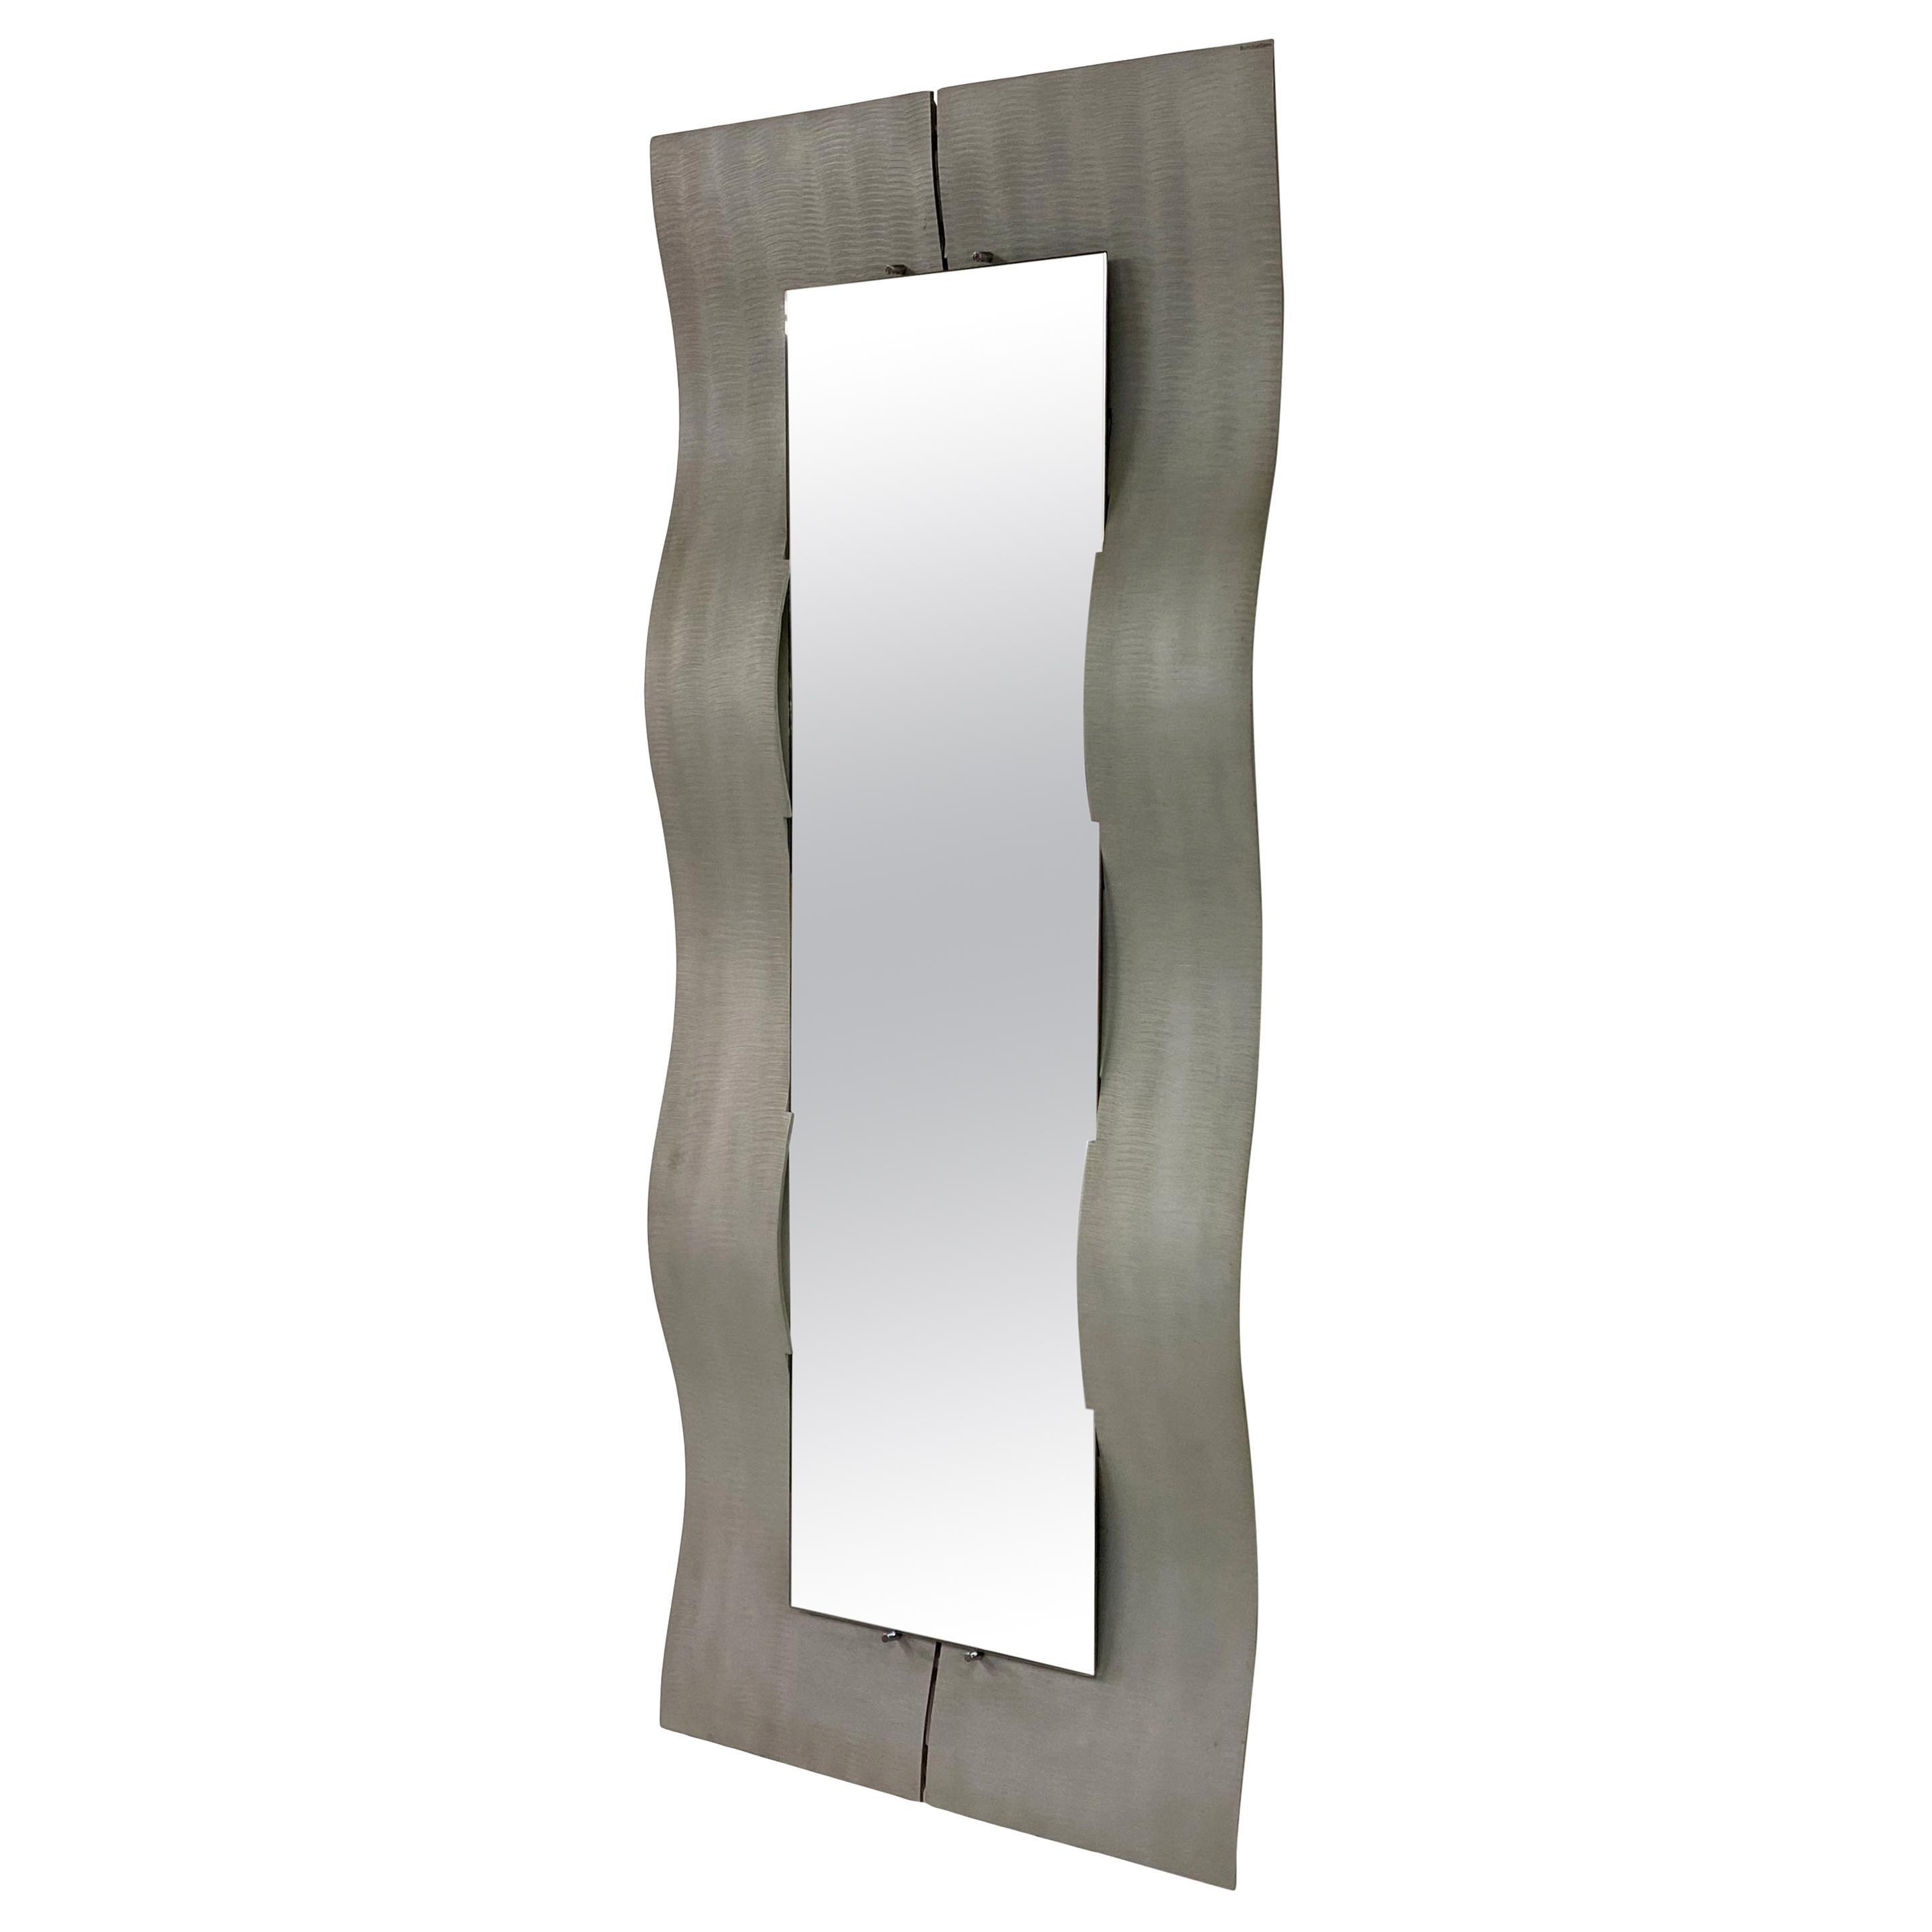 1970s Italian Aluminium Mirror by Lorenzo Burchiellaro